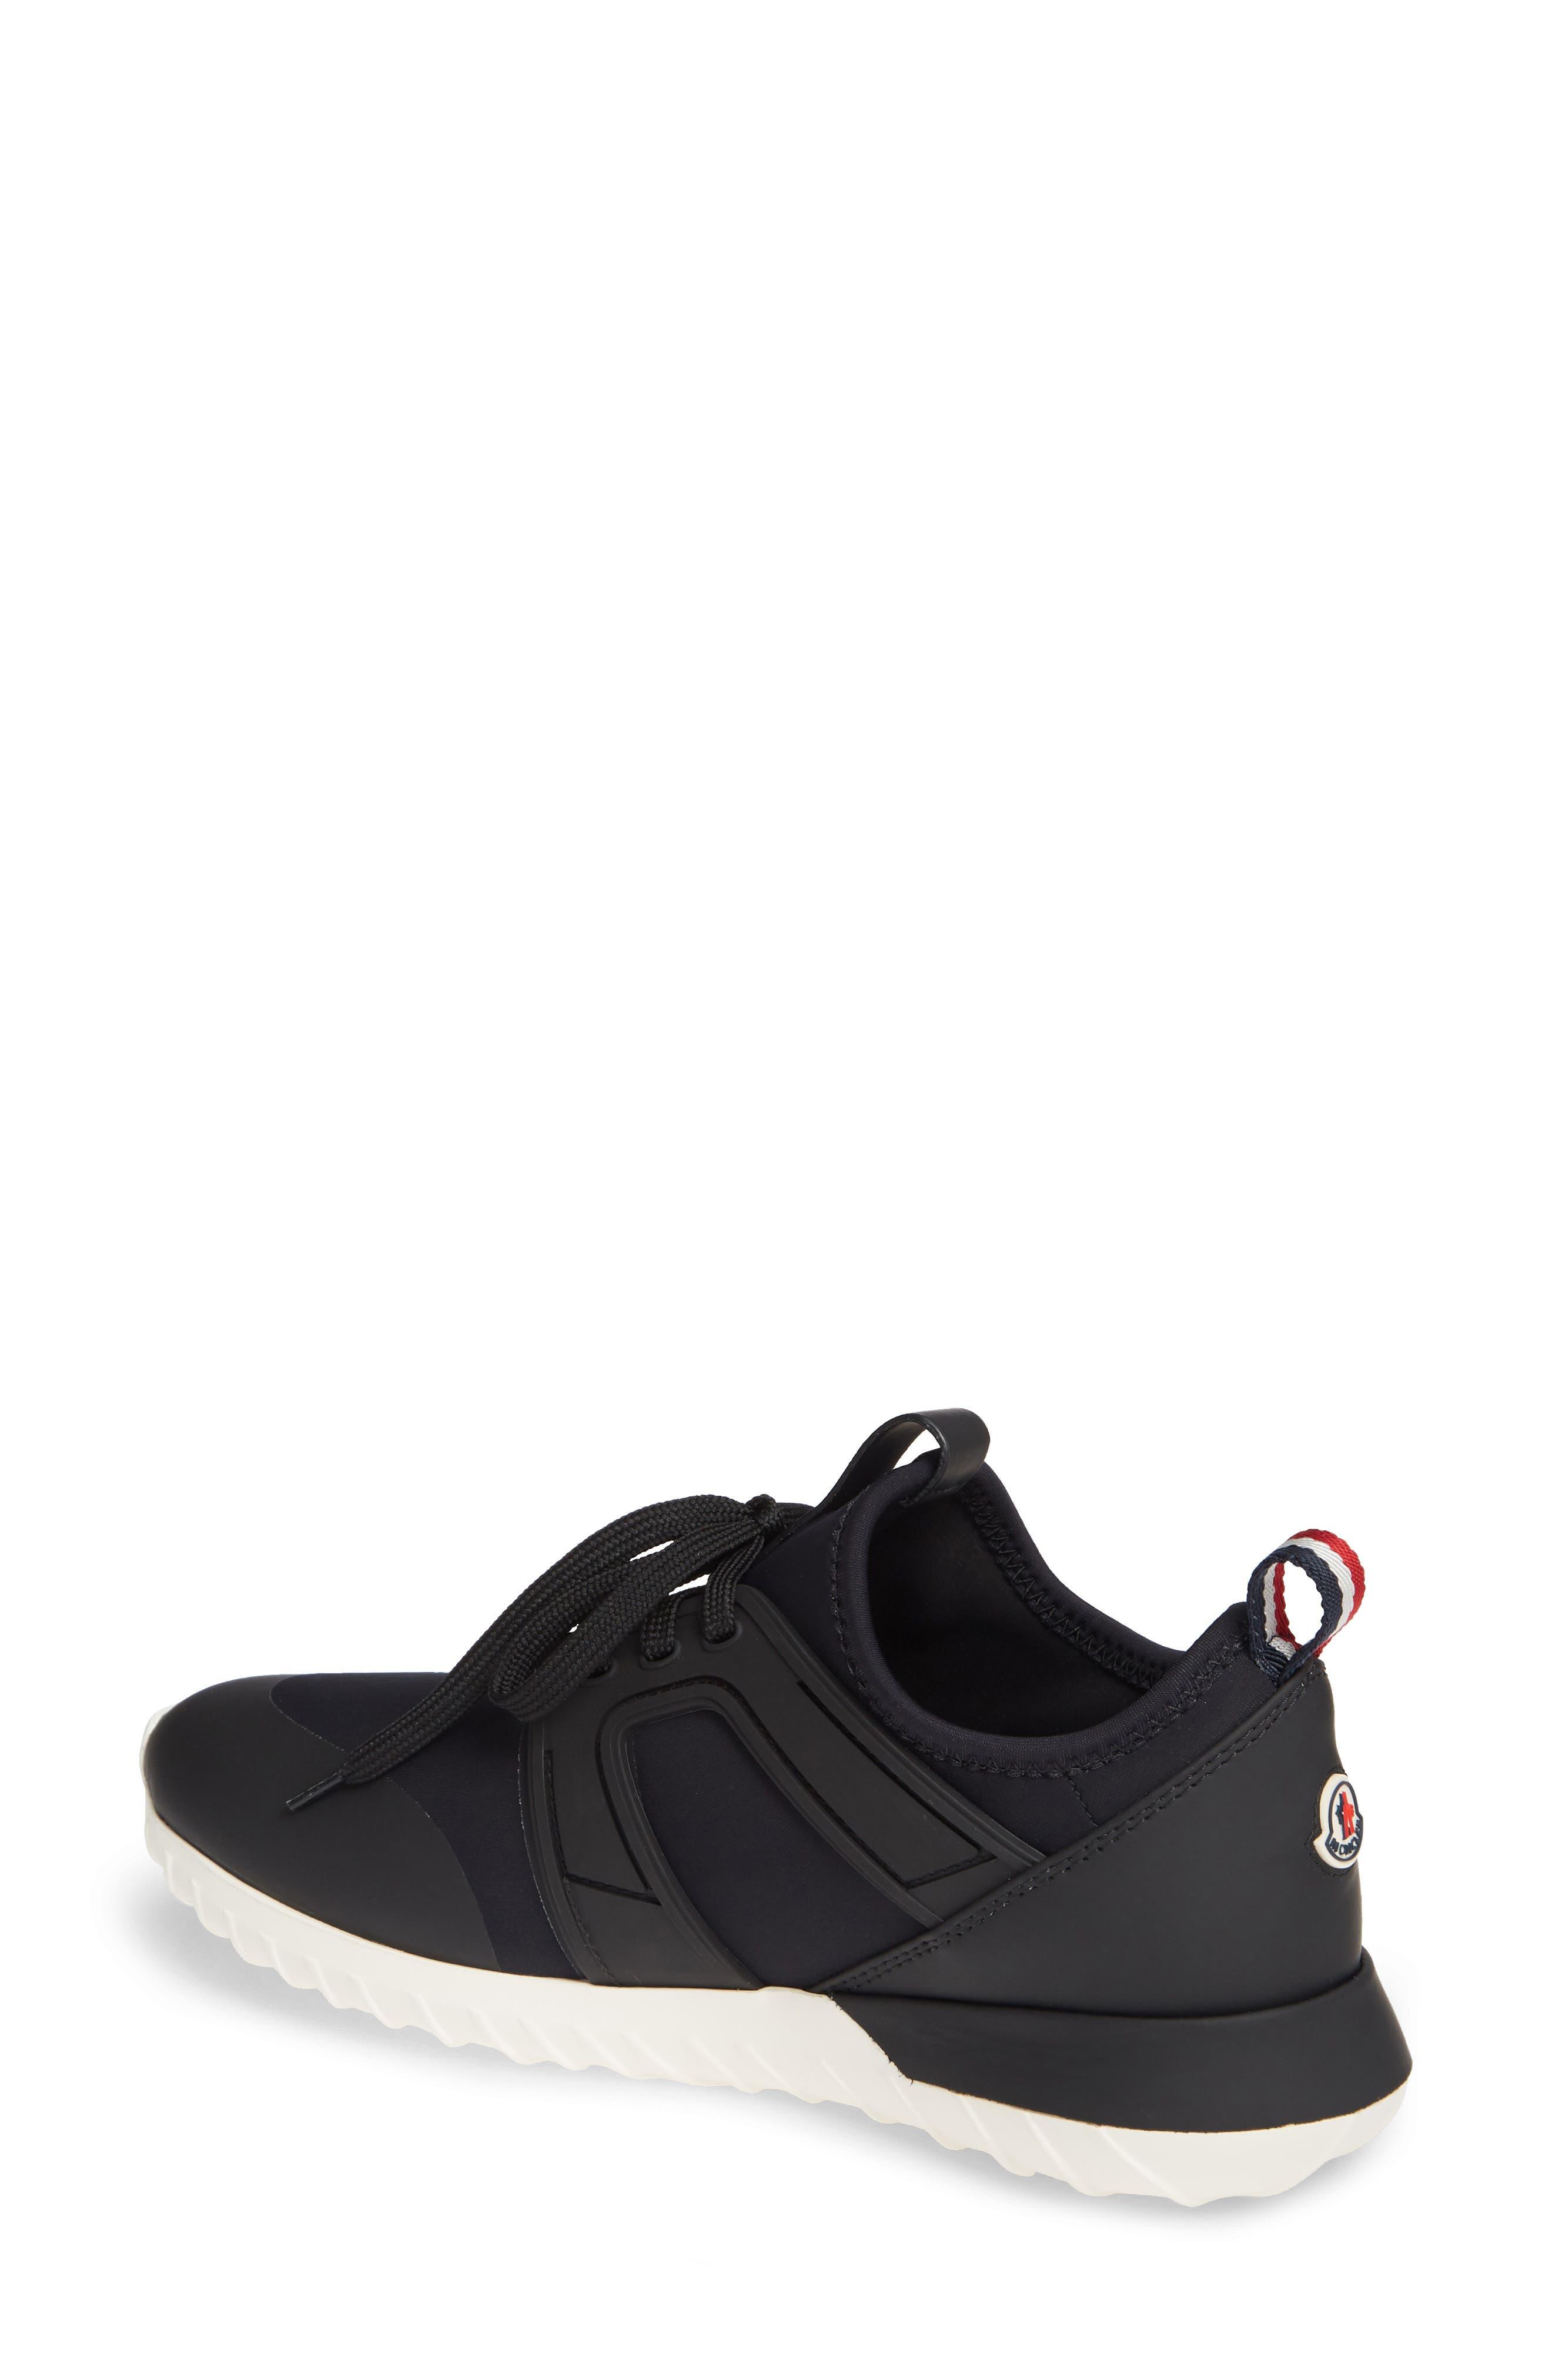 MONCLER, Meline Scarpa Sneaker, Alternate thumbnail 2, color, BLACK